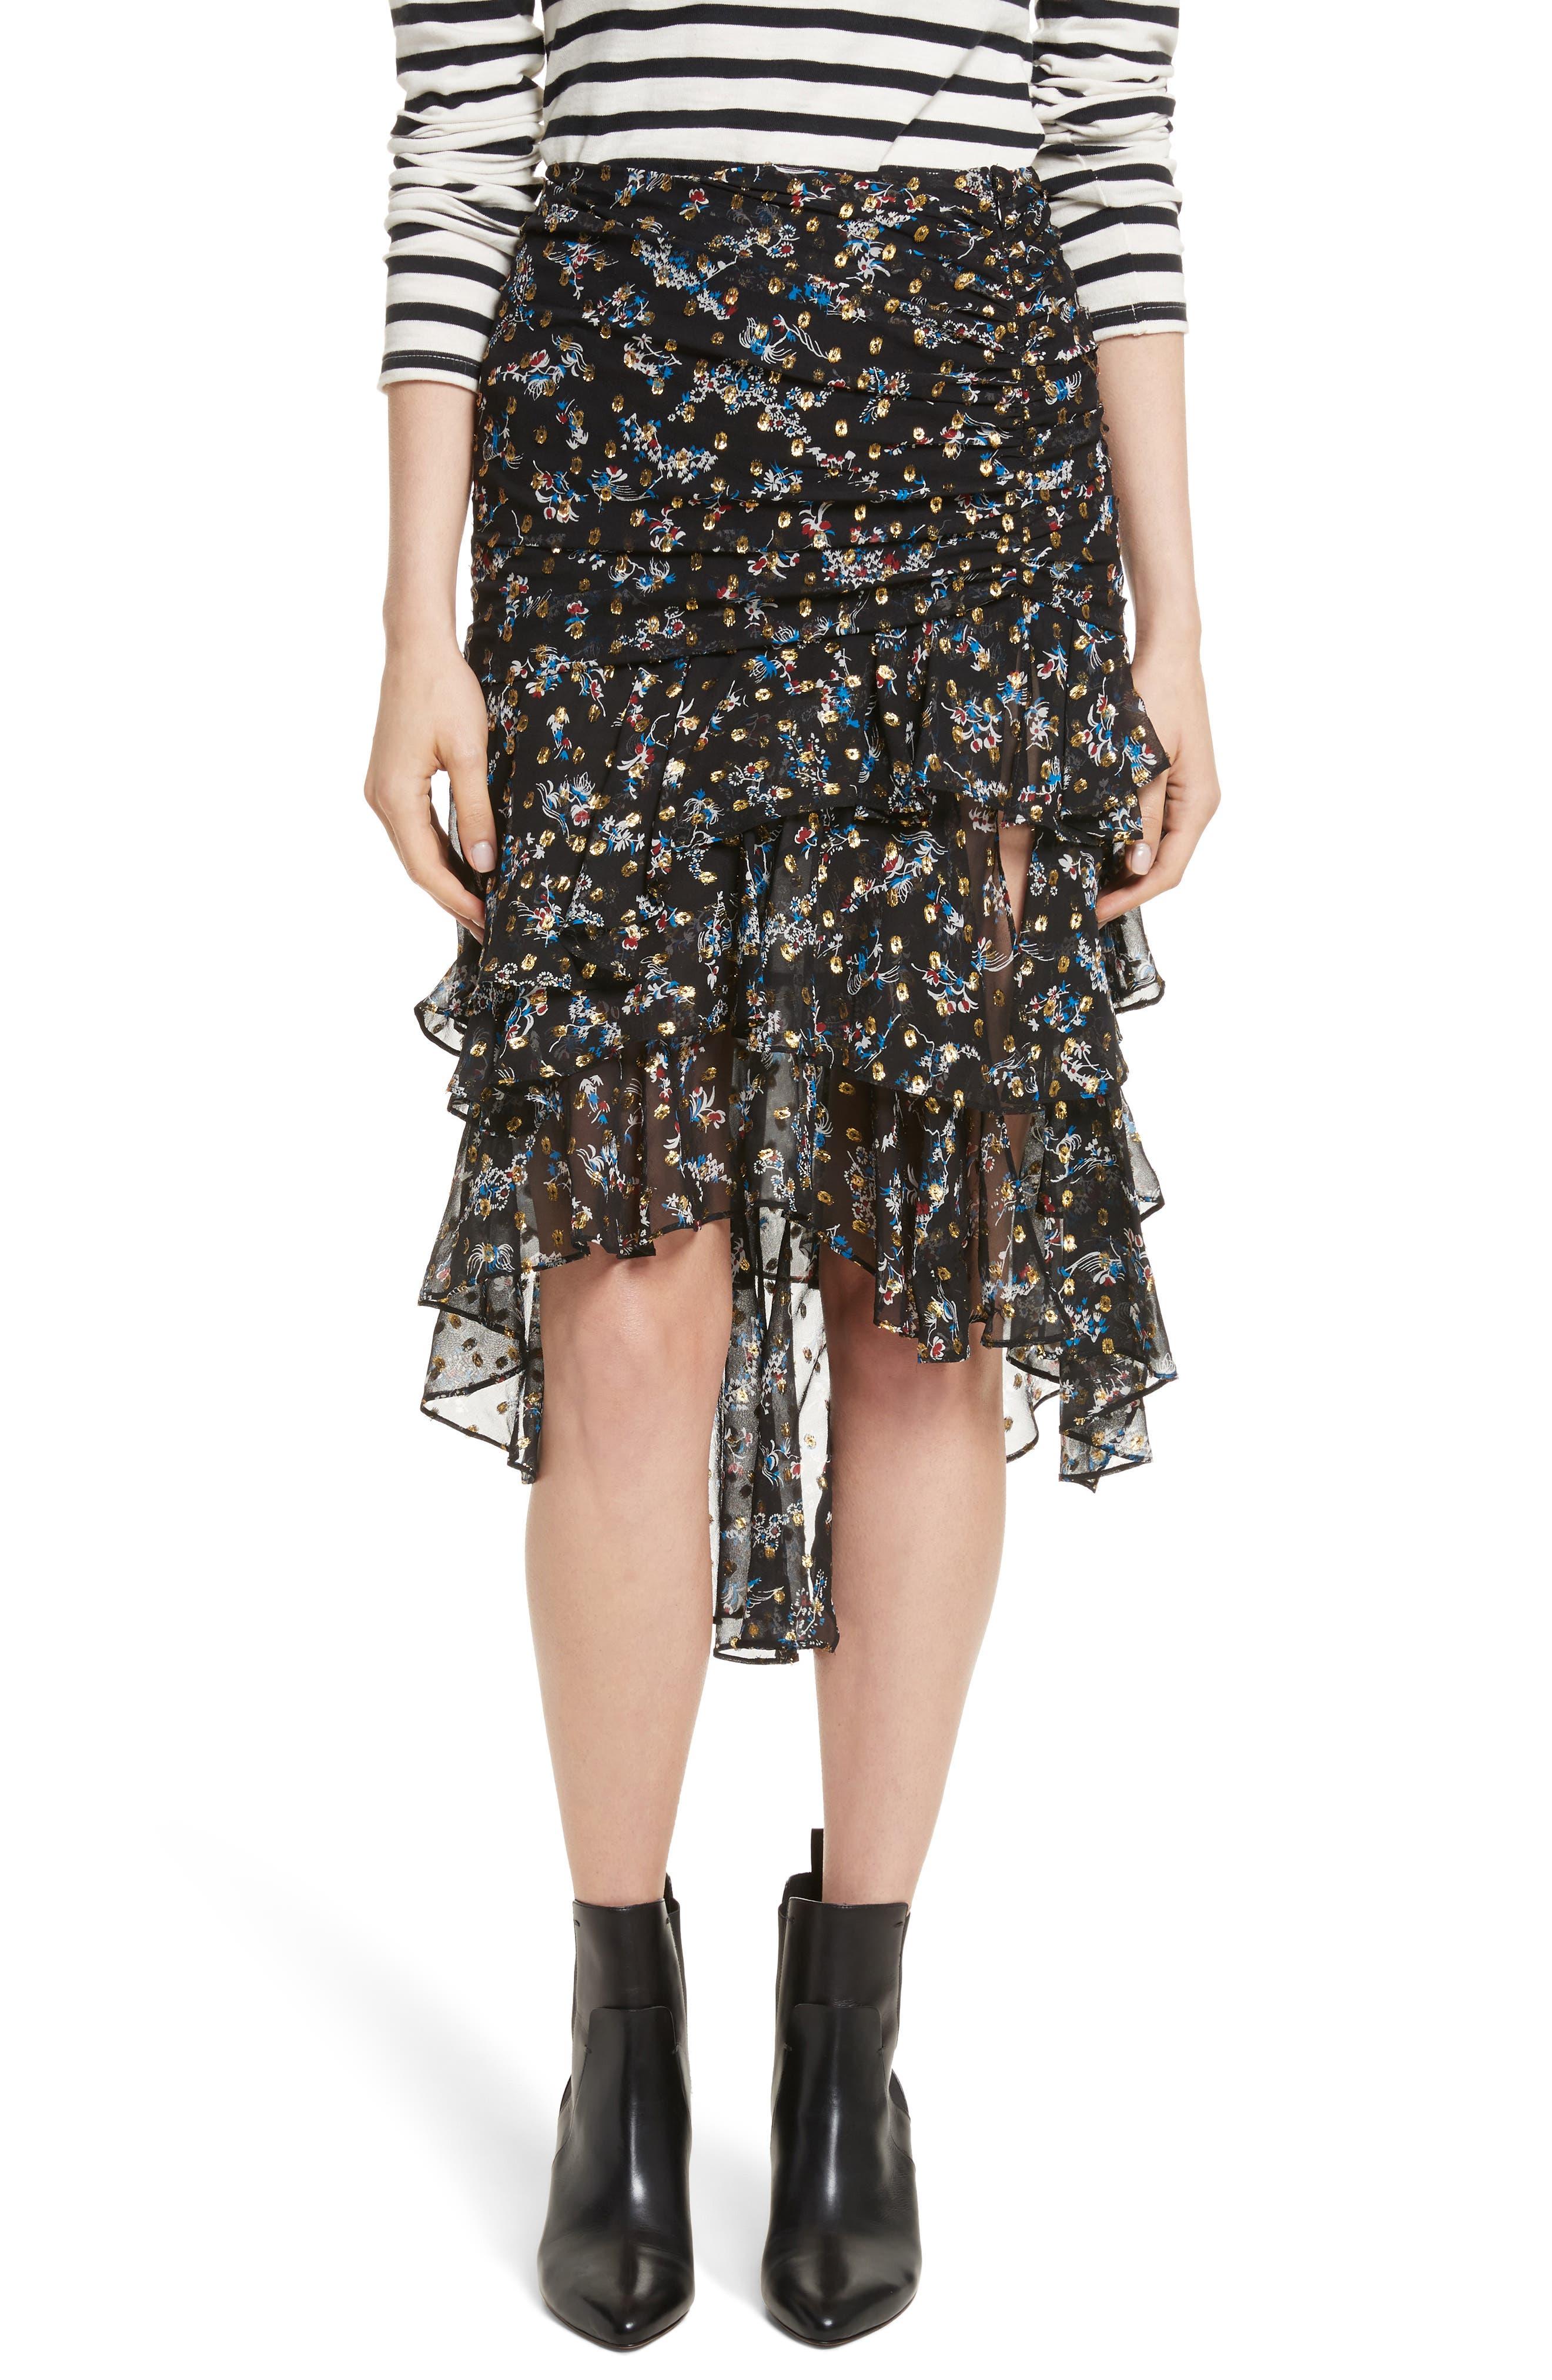 Main Image - Veronica Beard Cella Metallic Floral Print Midi Skirt